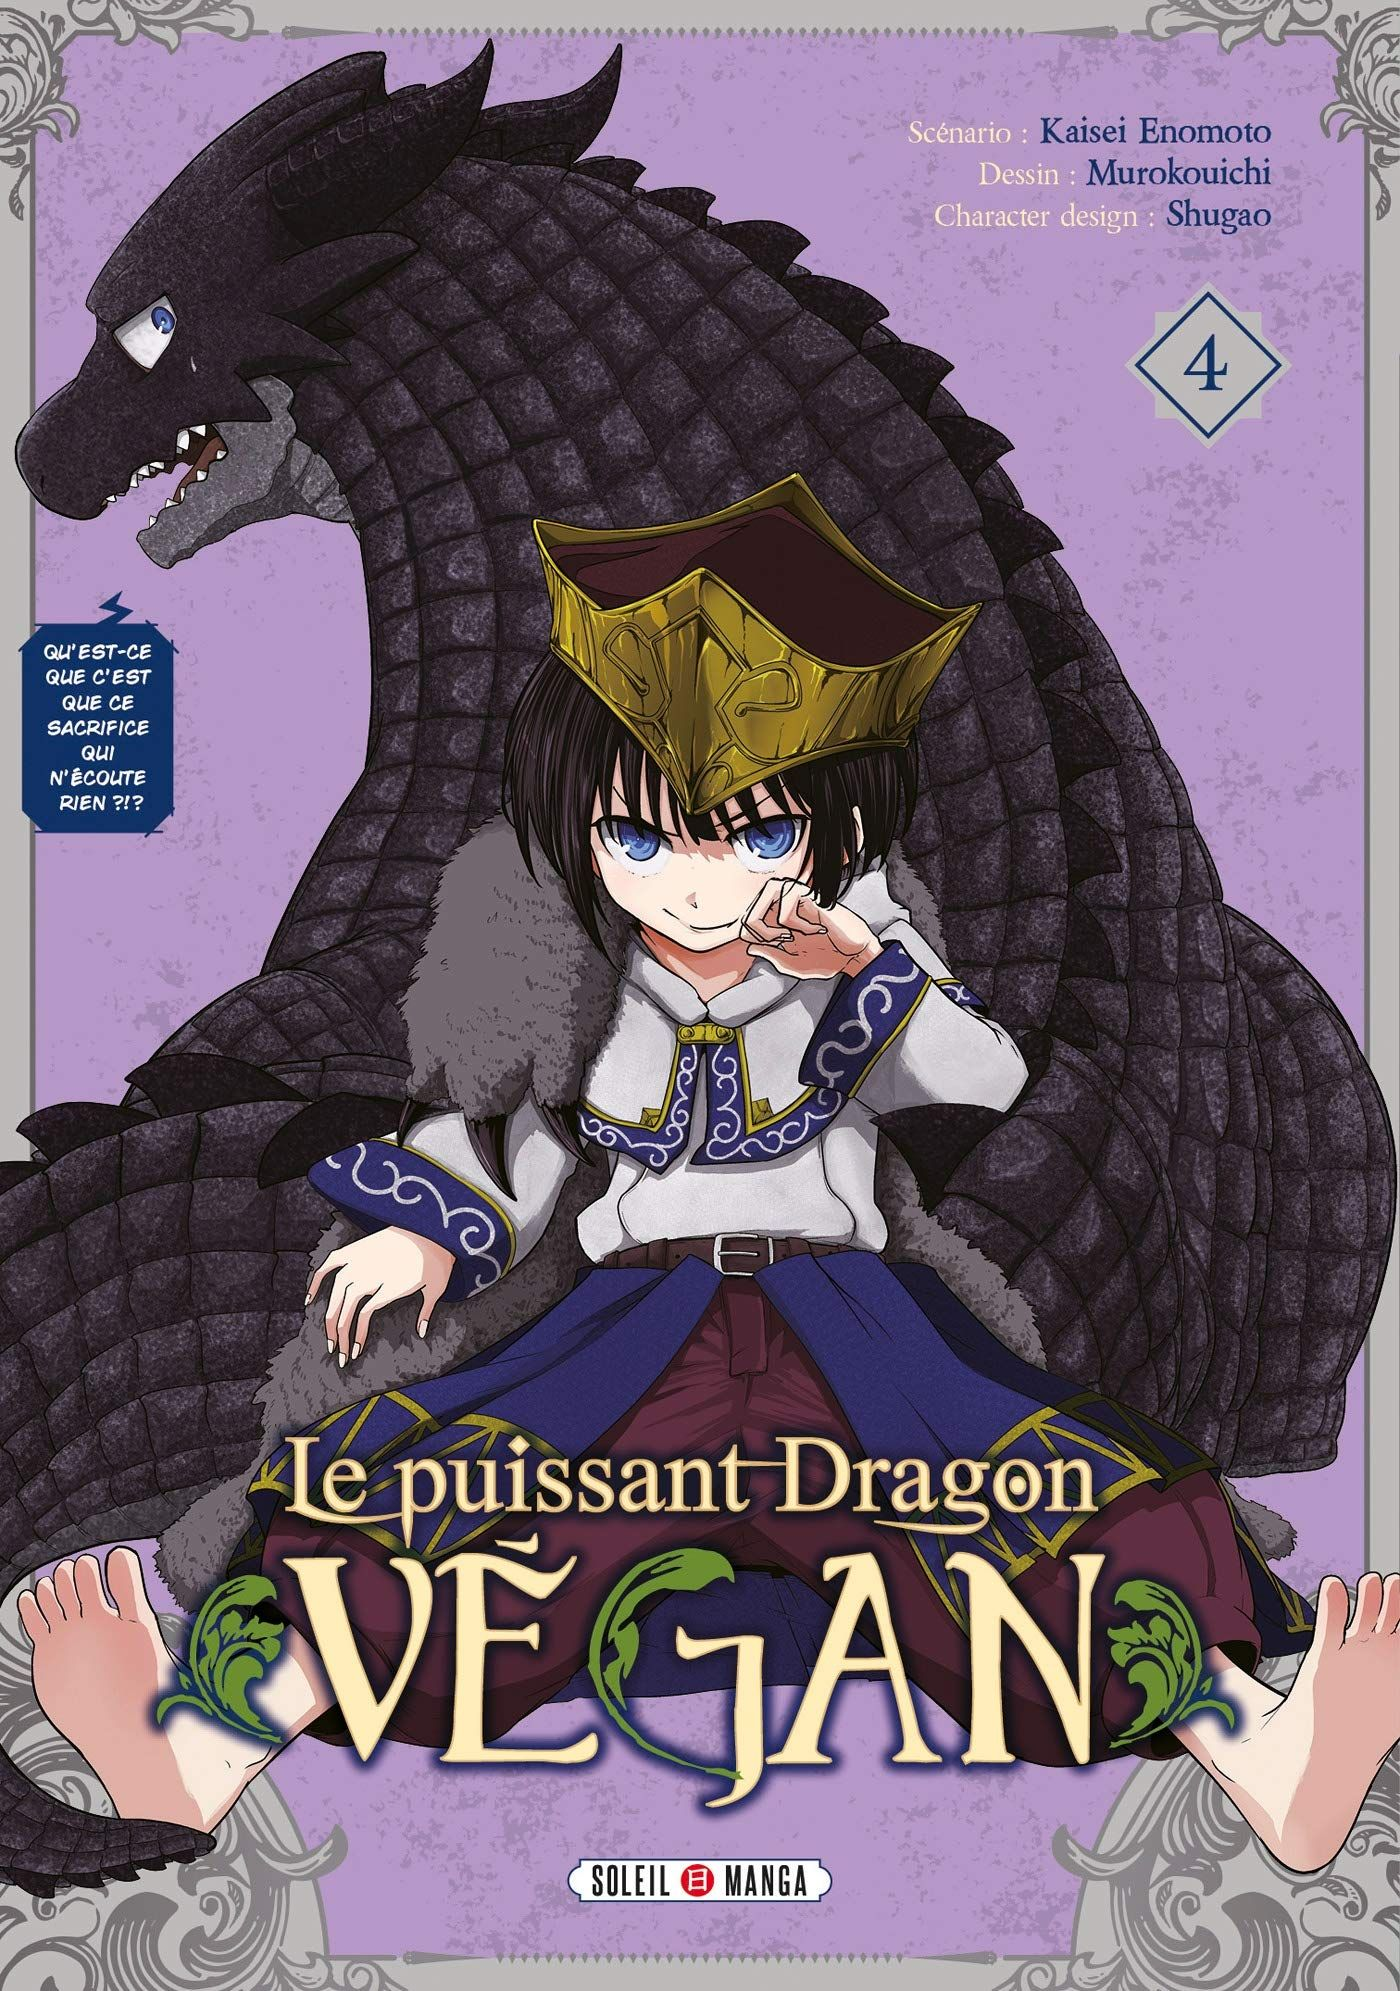 Sortie Manga au Québec JUILLET 2021 Puissant-dragon-vegan-4-soleil